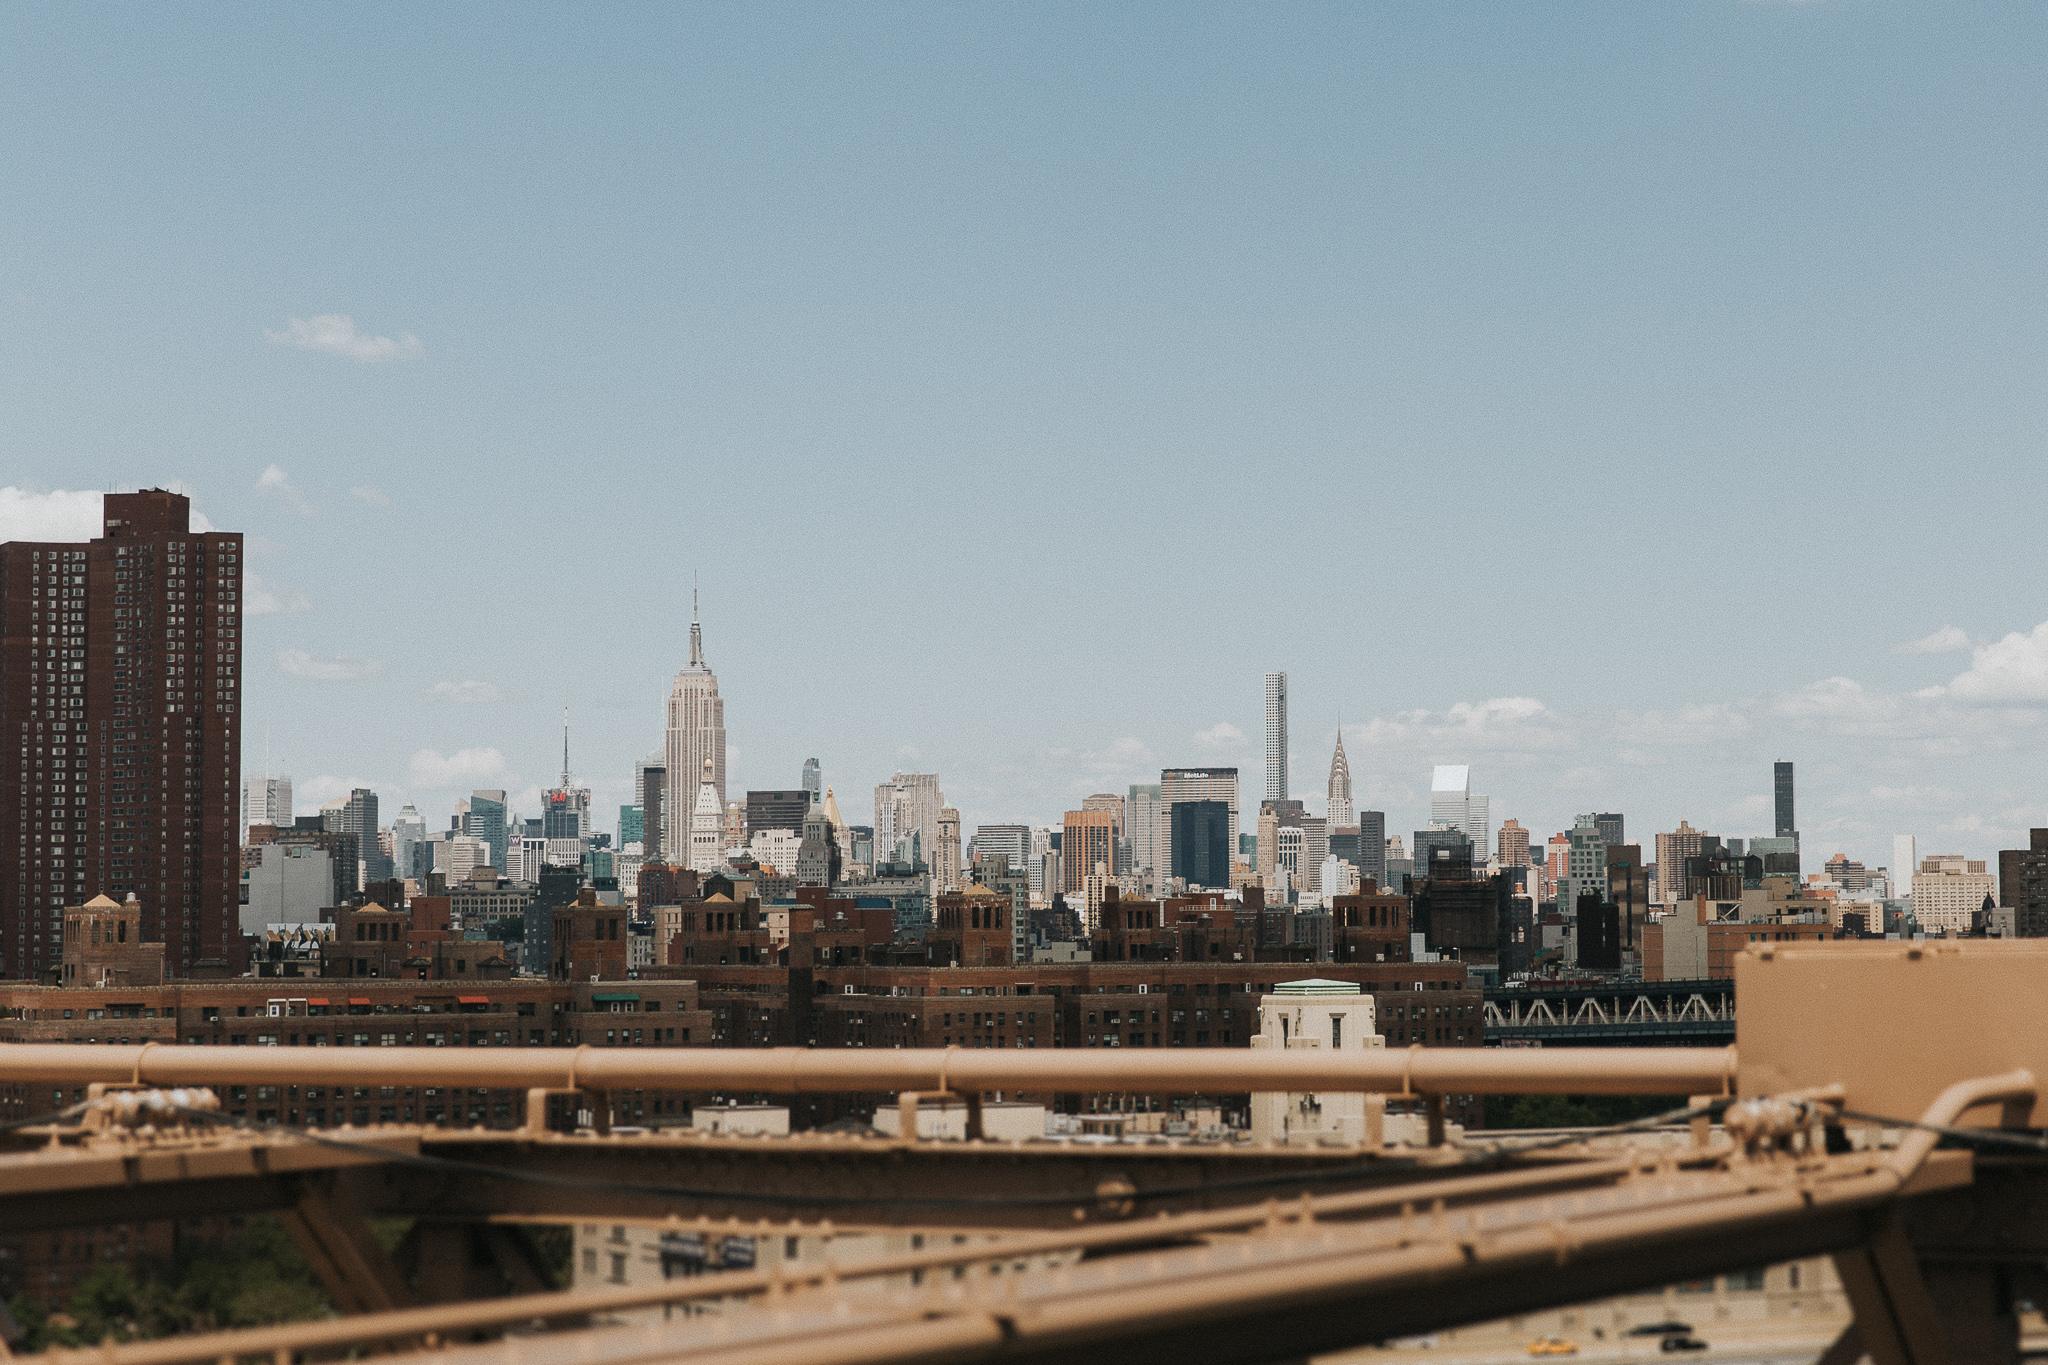 New York travel photography001.JPG